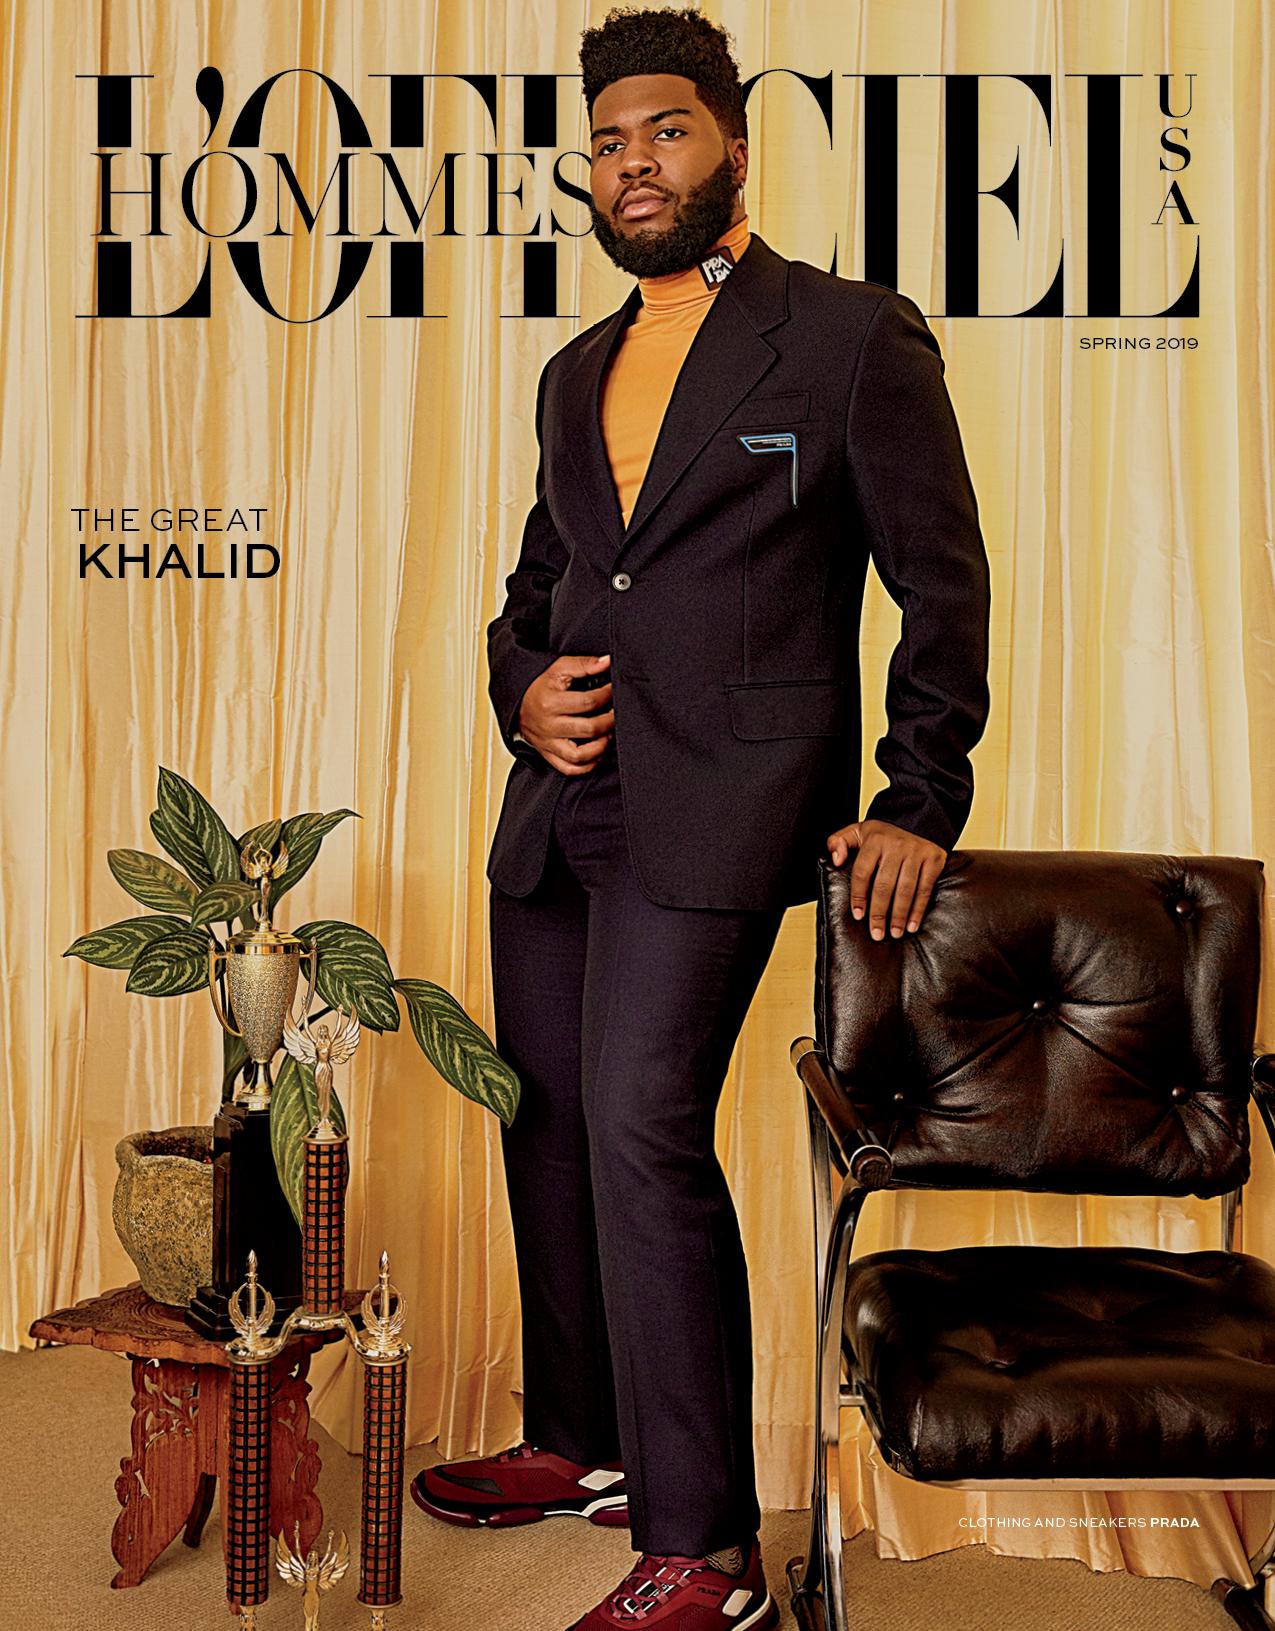 Khalid by Danielle Levitt for L'Officiel USA